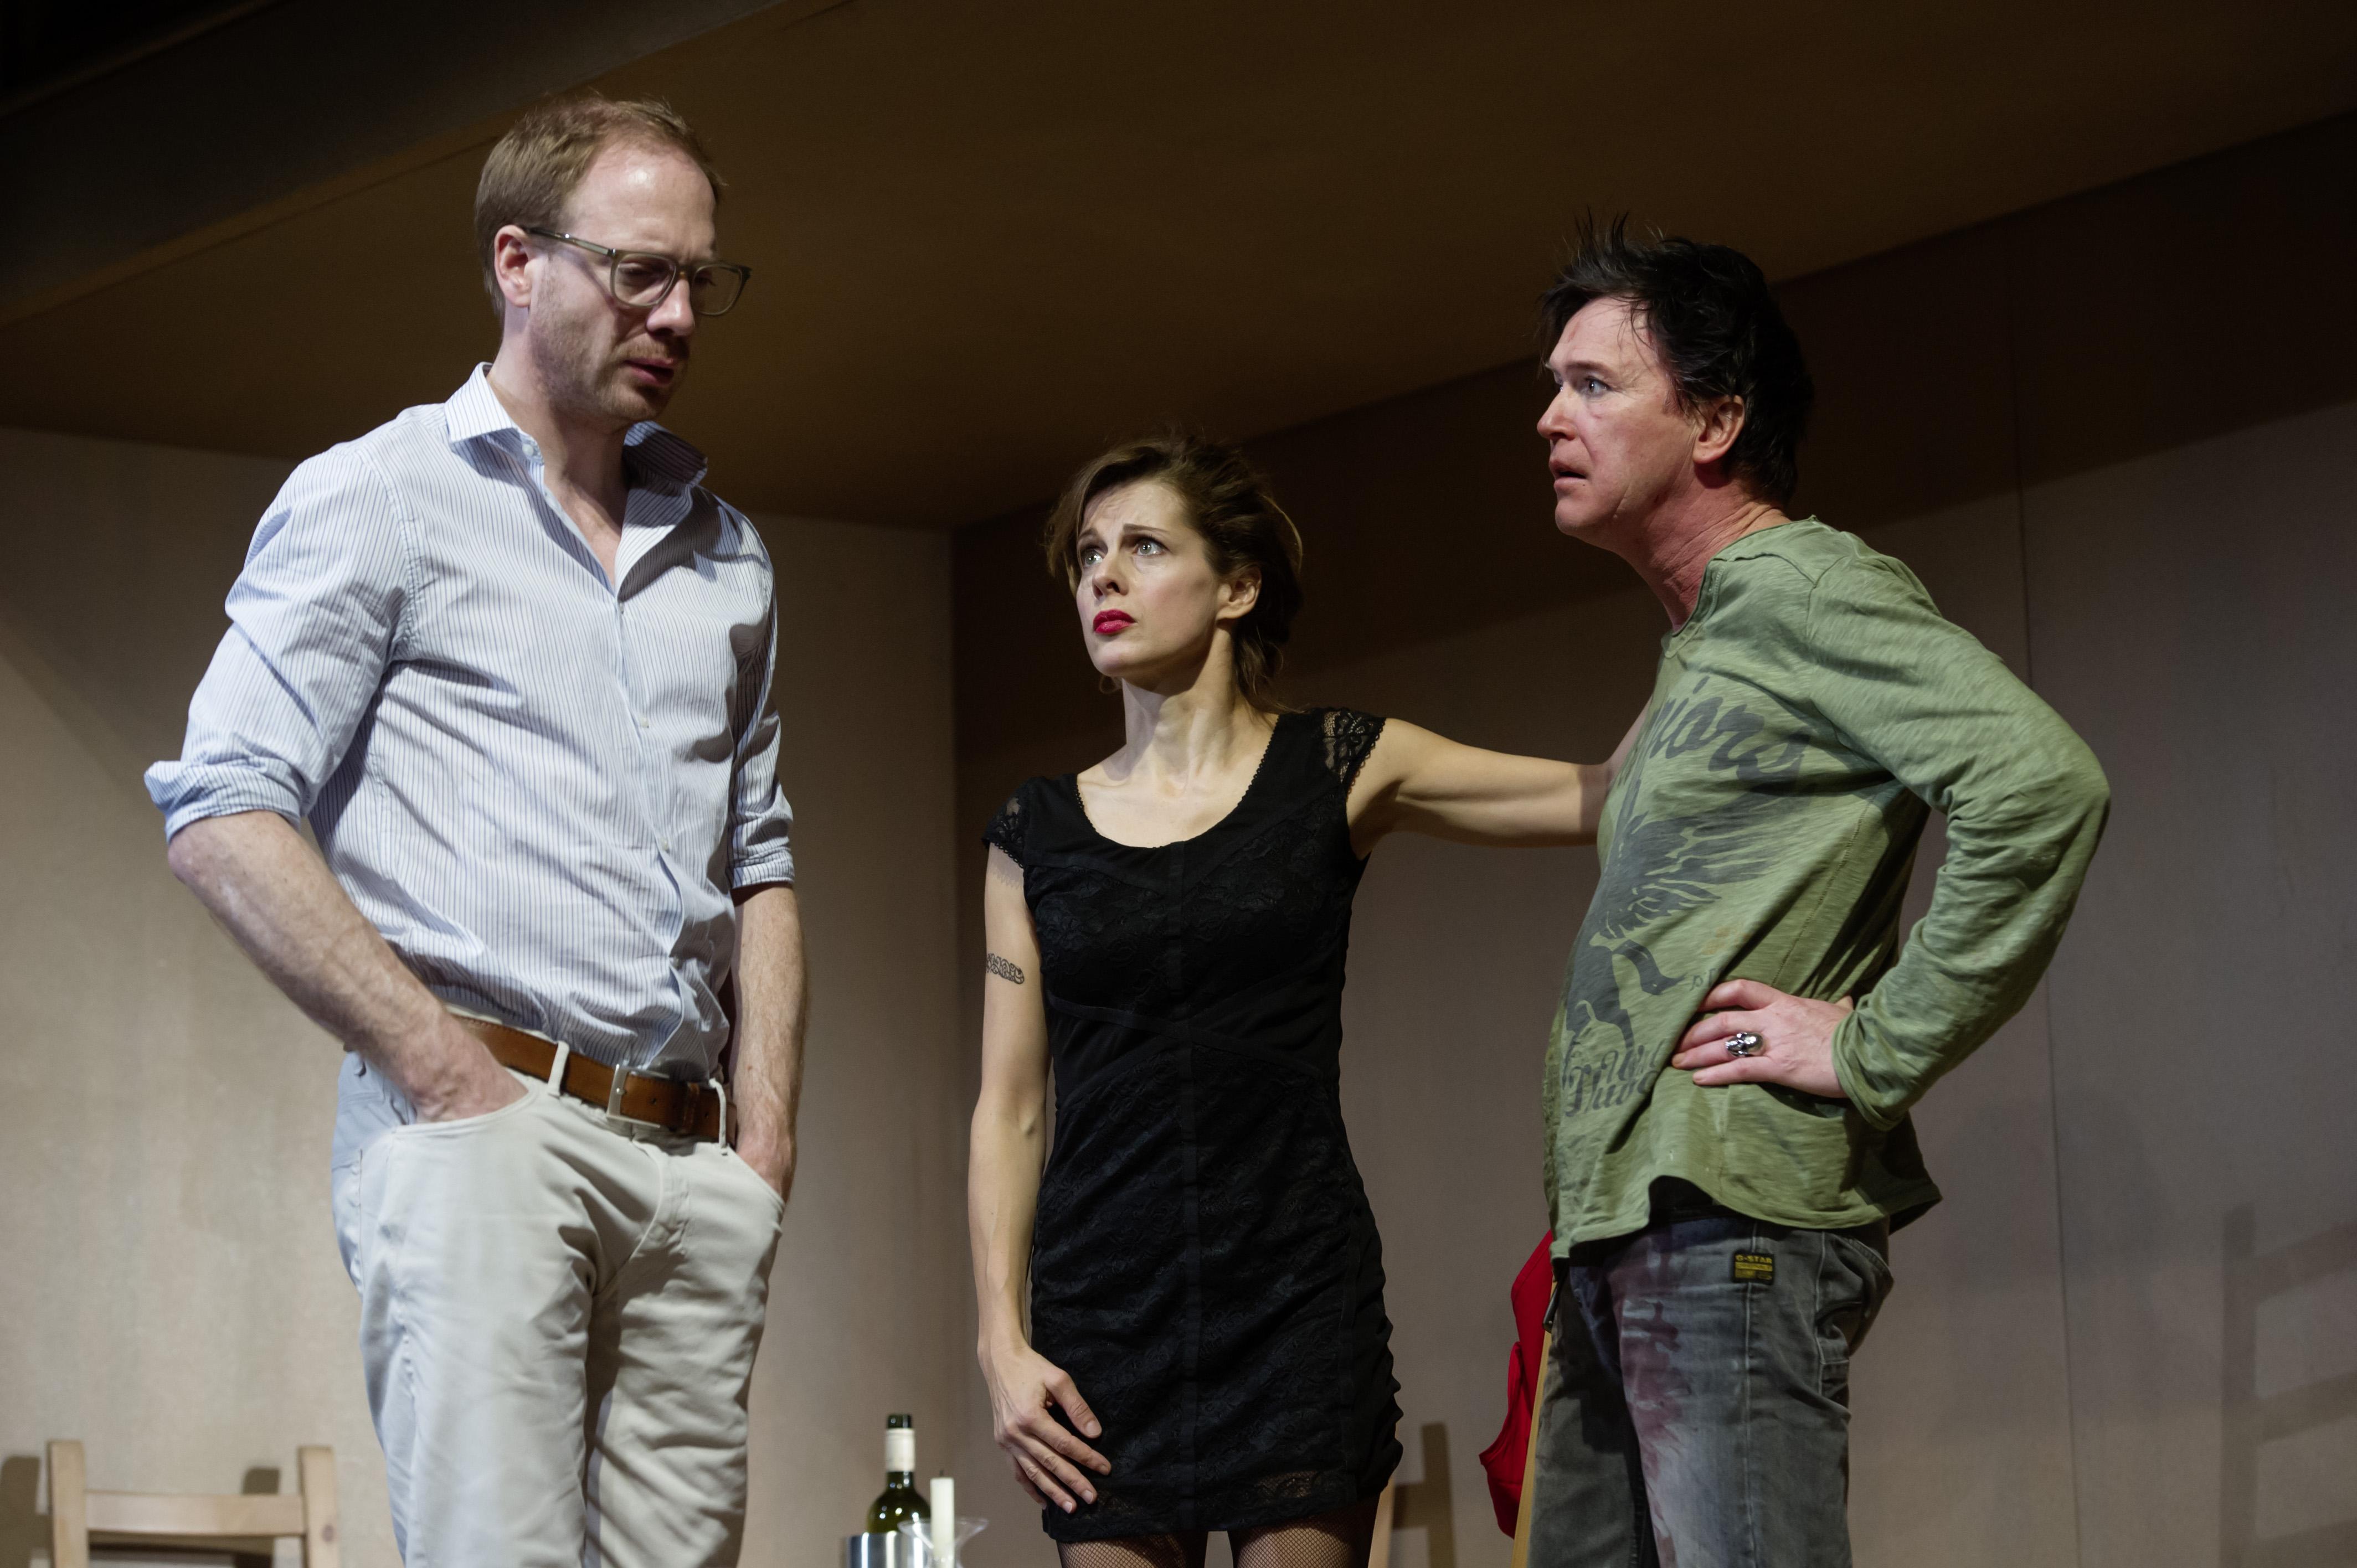 Waisen v.l.n.r.: Johann von Bülow, Judith Rosmair, Uwe Bohm © Oliver Fantitsch